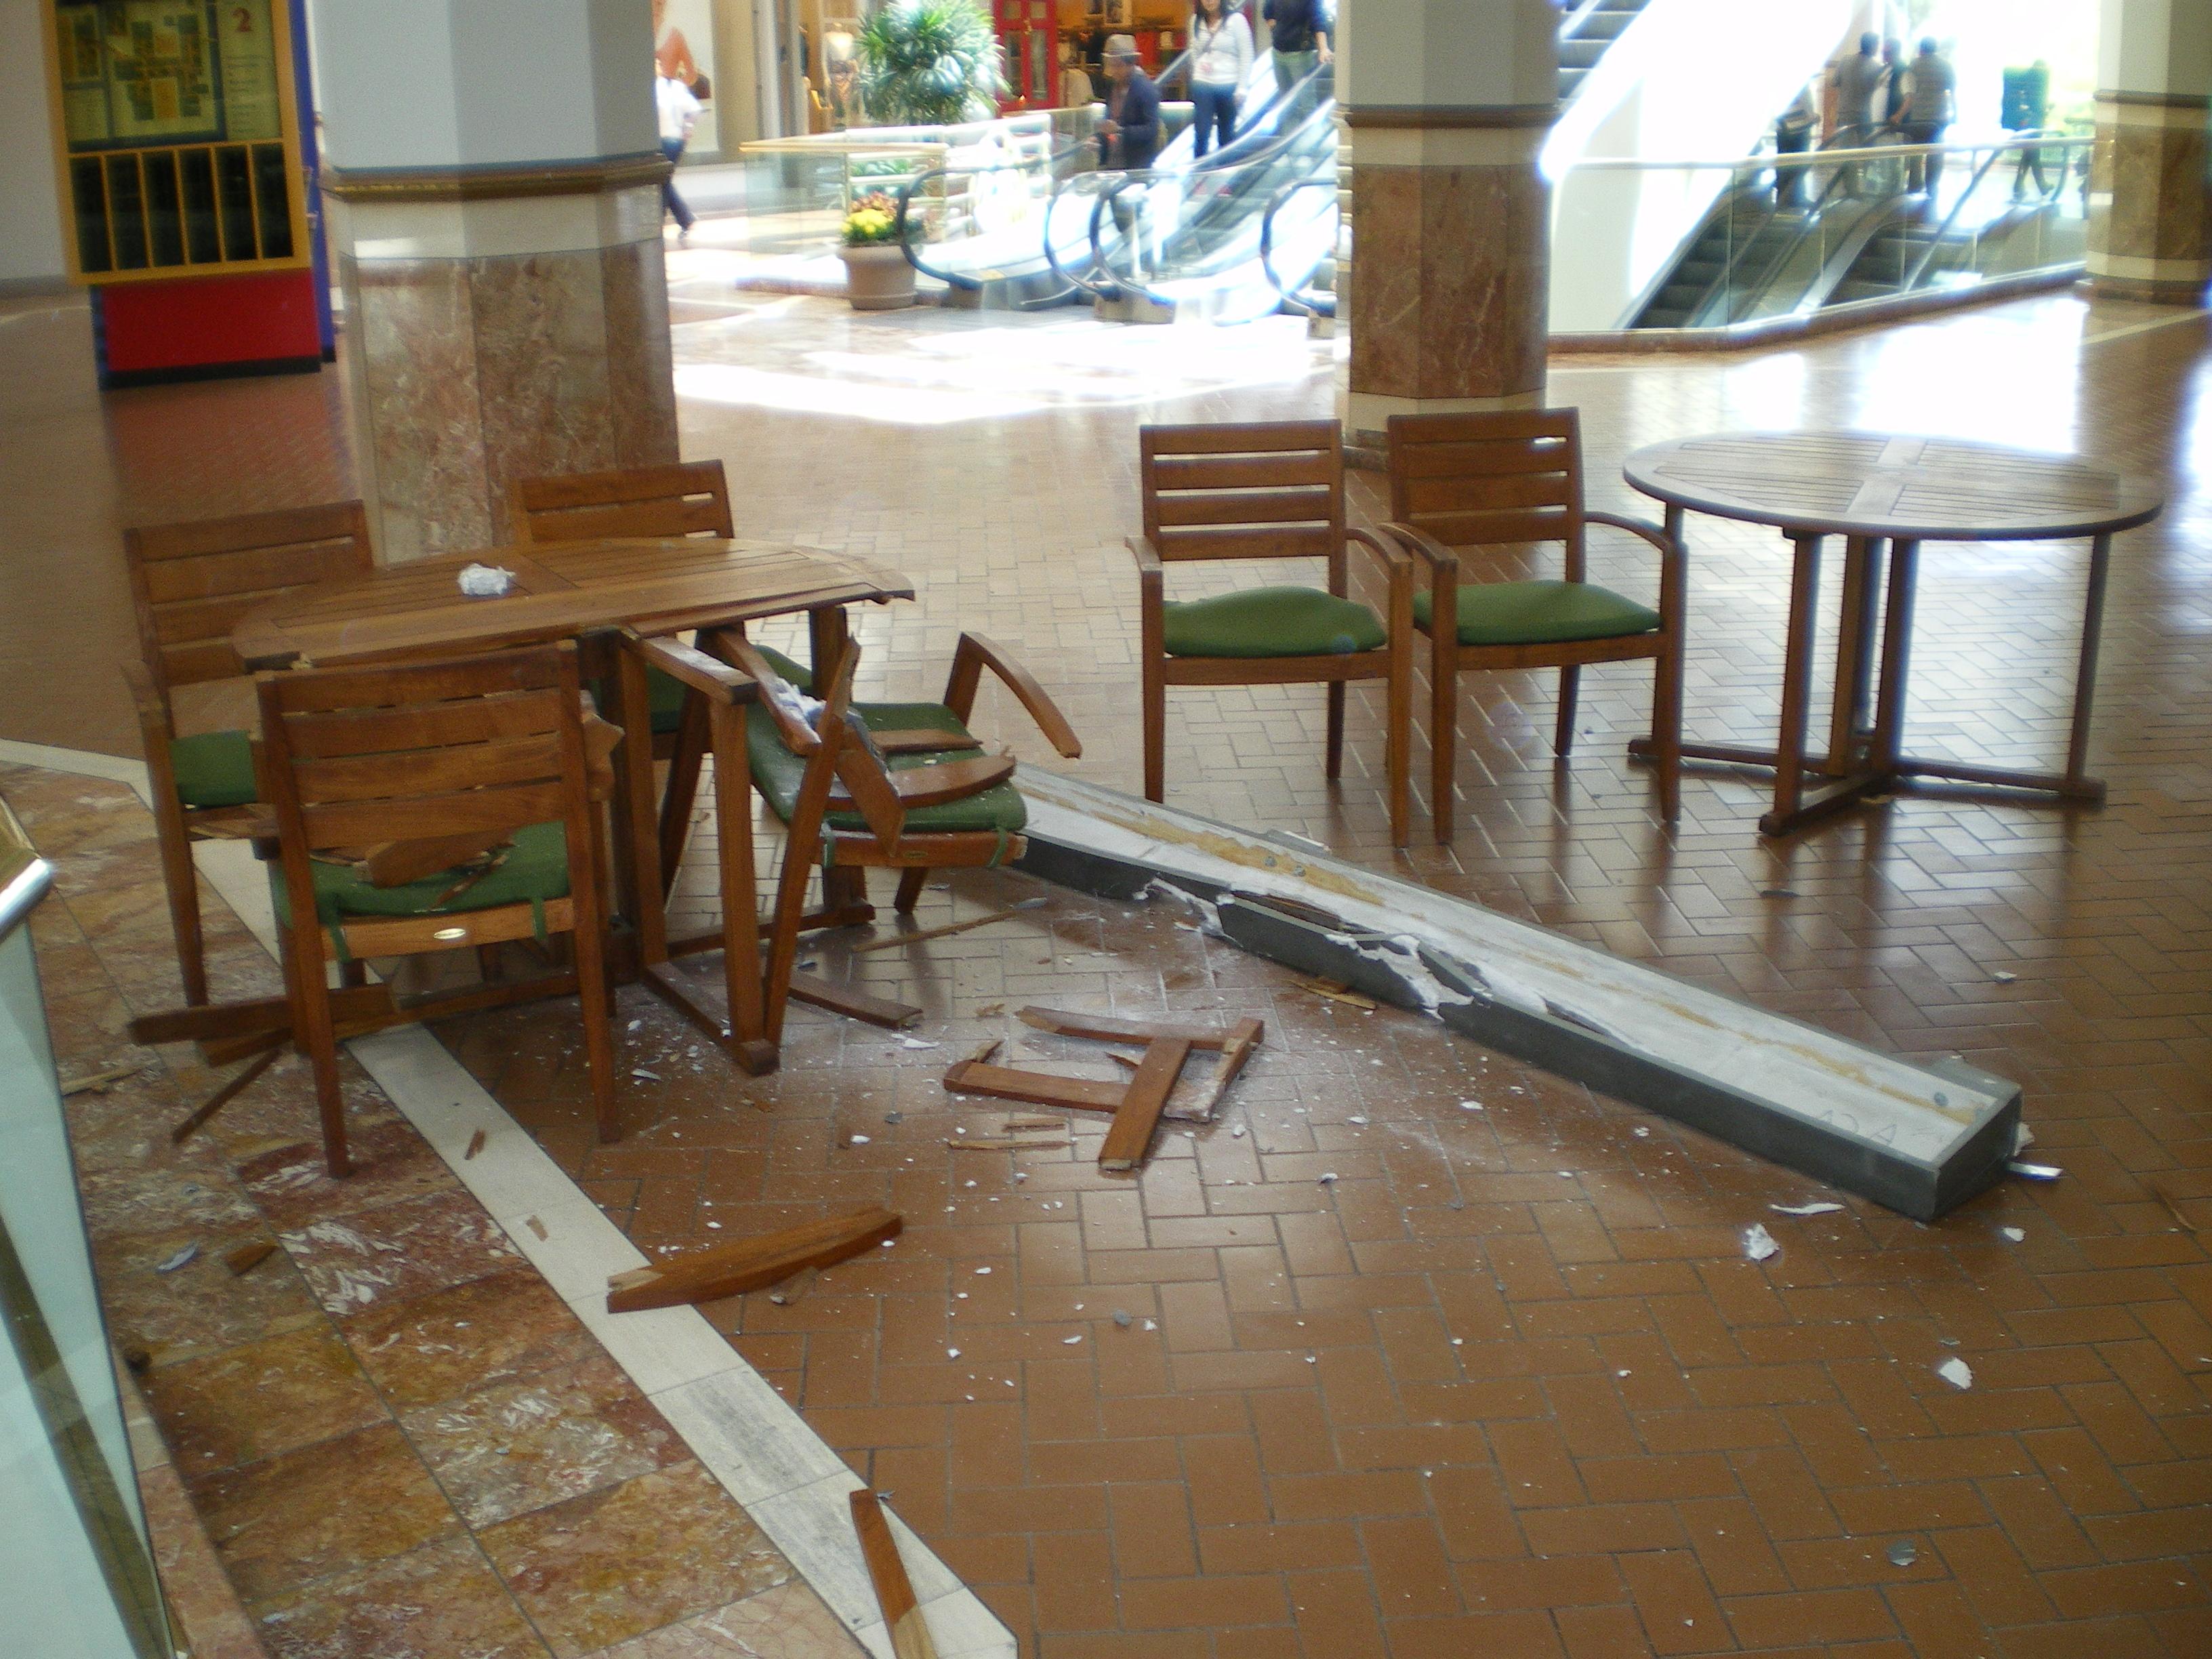 File:South Coast Plaza earthquake damage in 2008.jpg - Wikimedia Commons